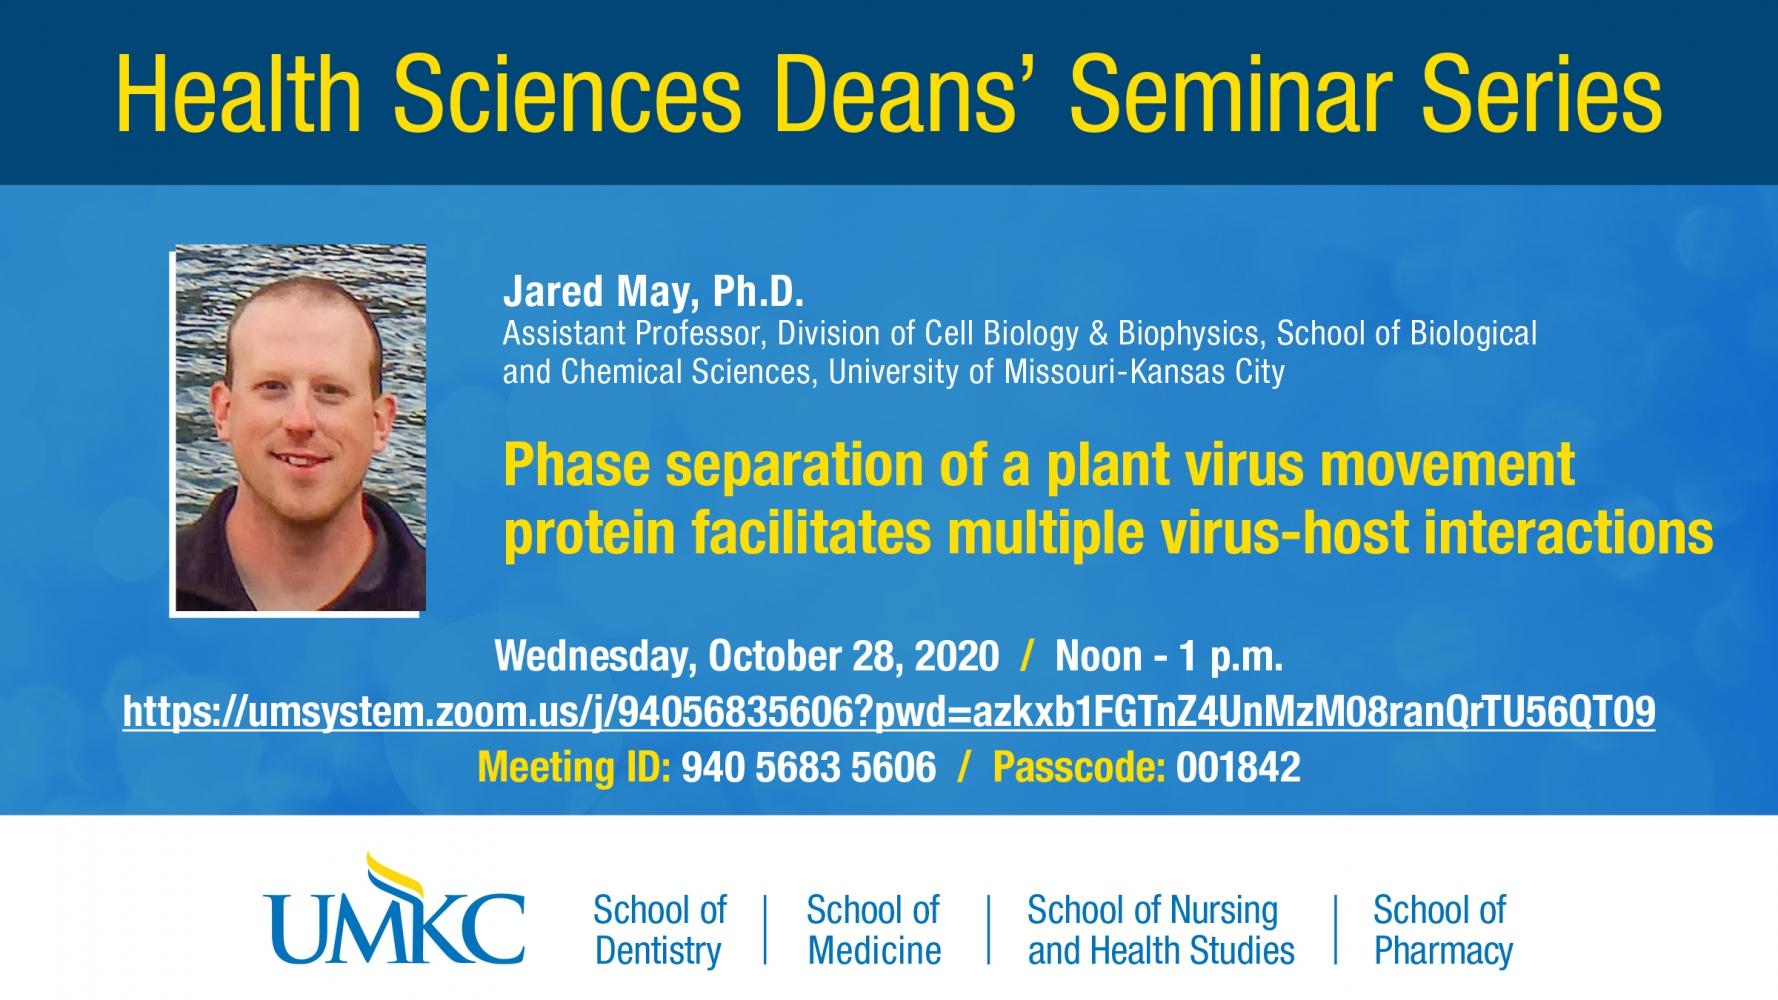 Health Sciences Deans' Seminar Series @ ZOOM